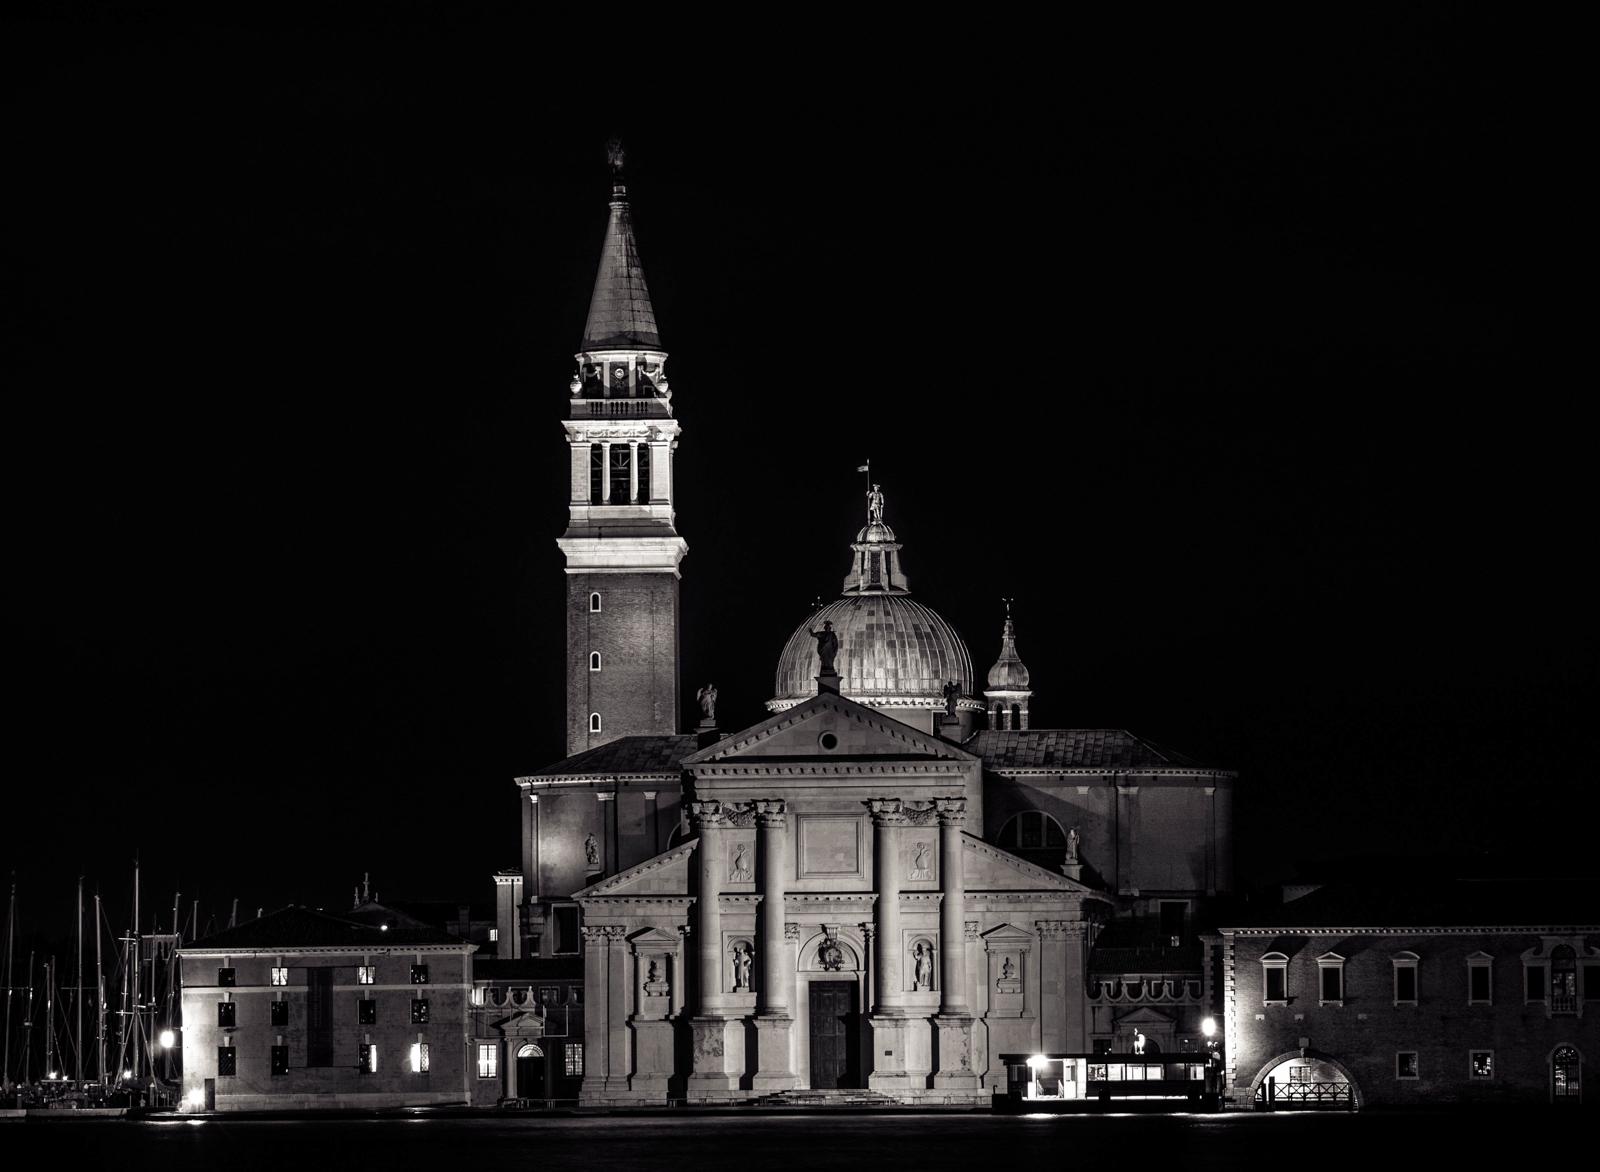 San giorgio after dark